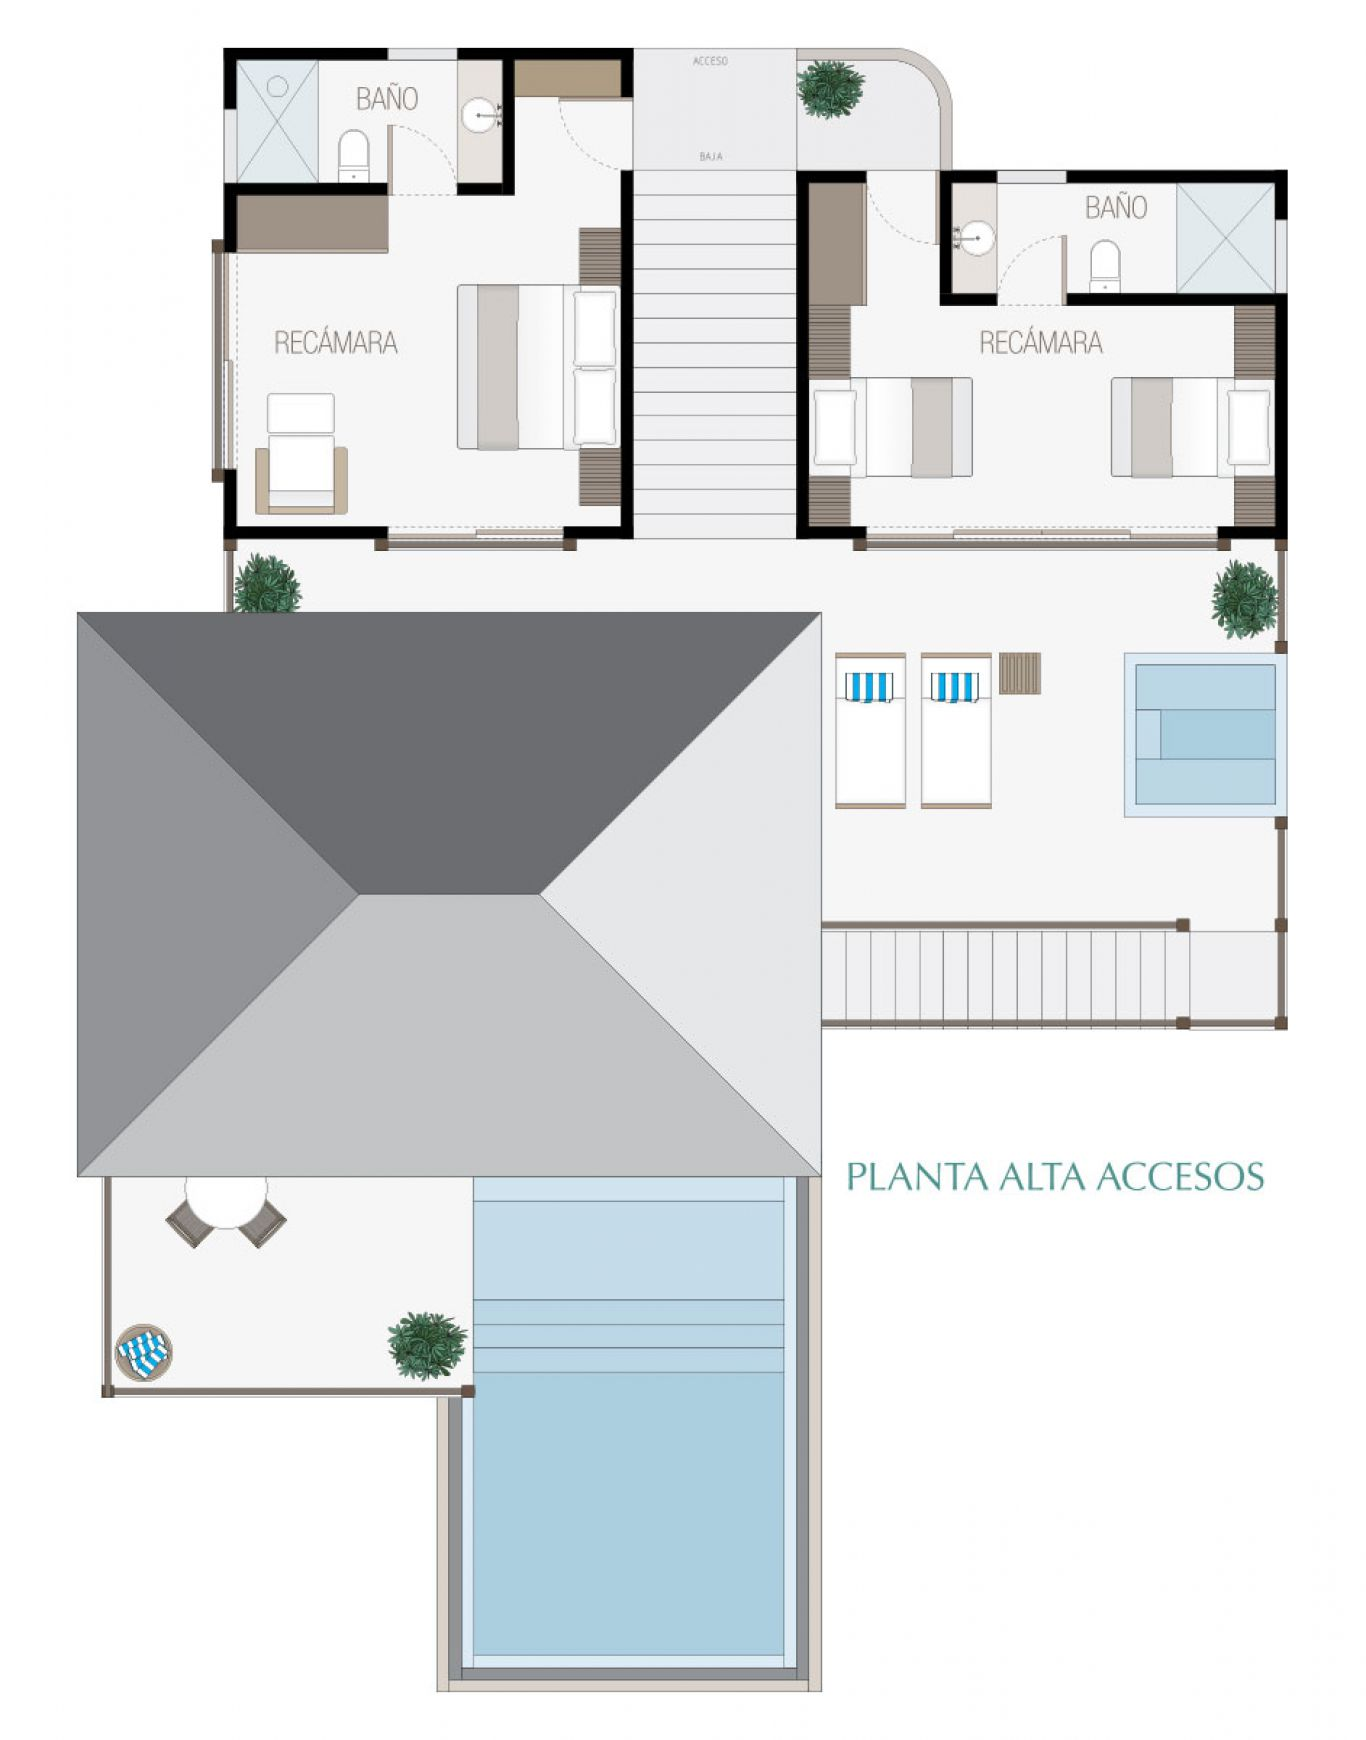 Manai, id 1519068, no 4, plano de villa 9, 302